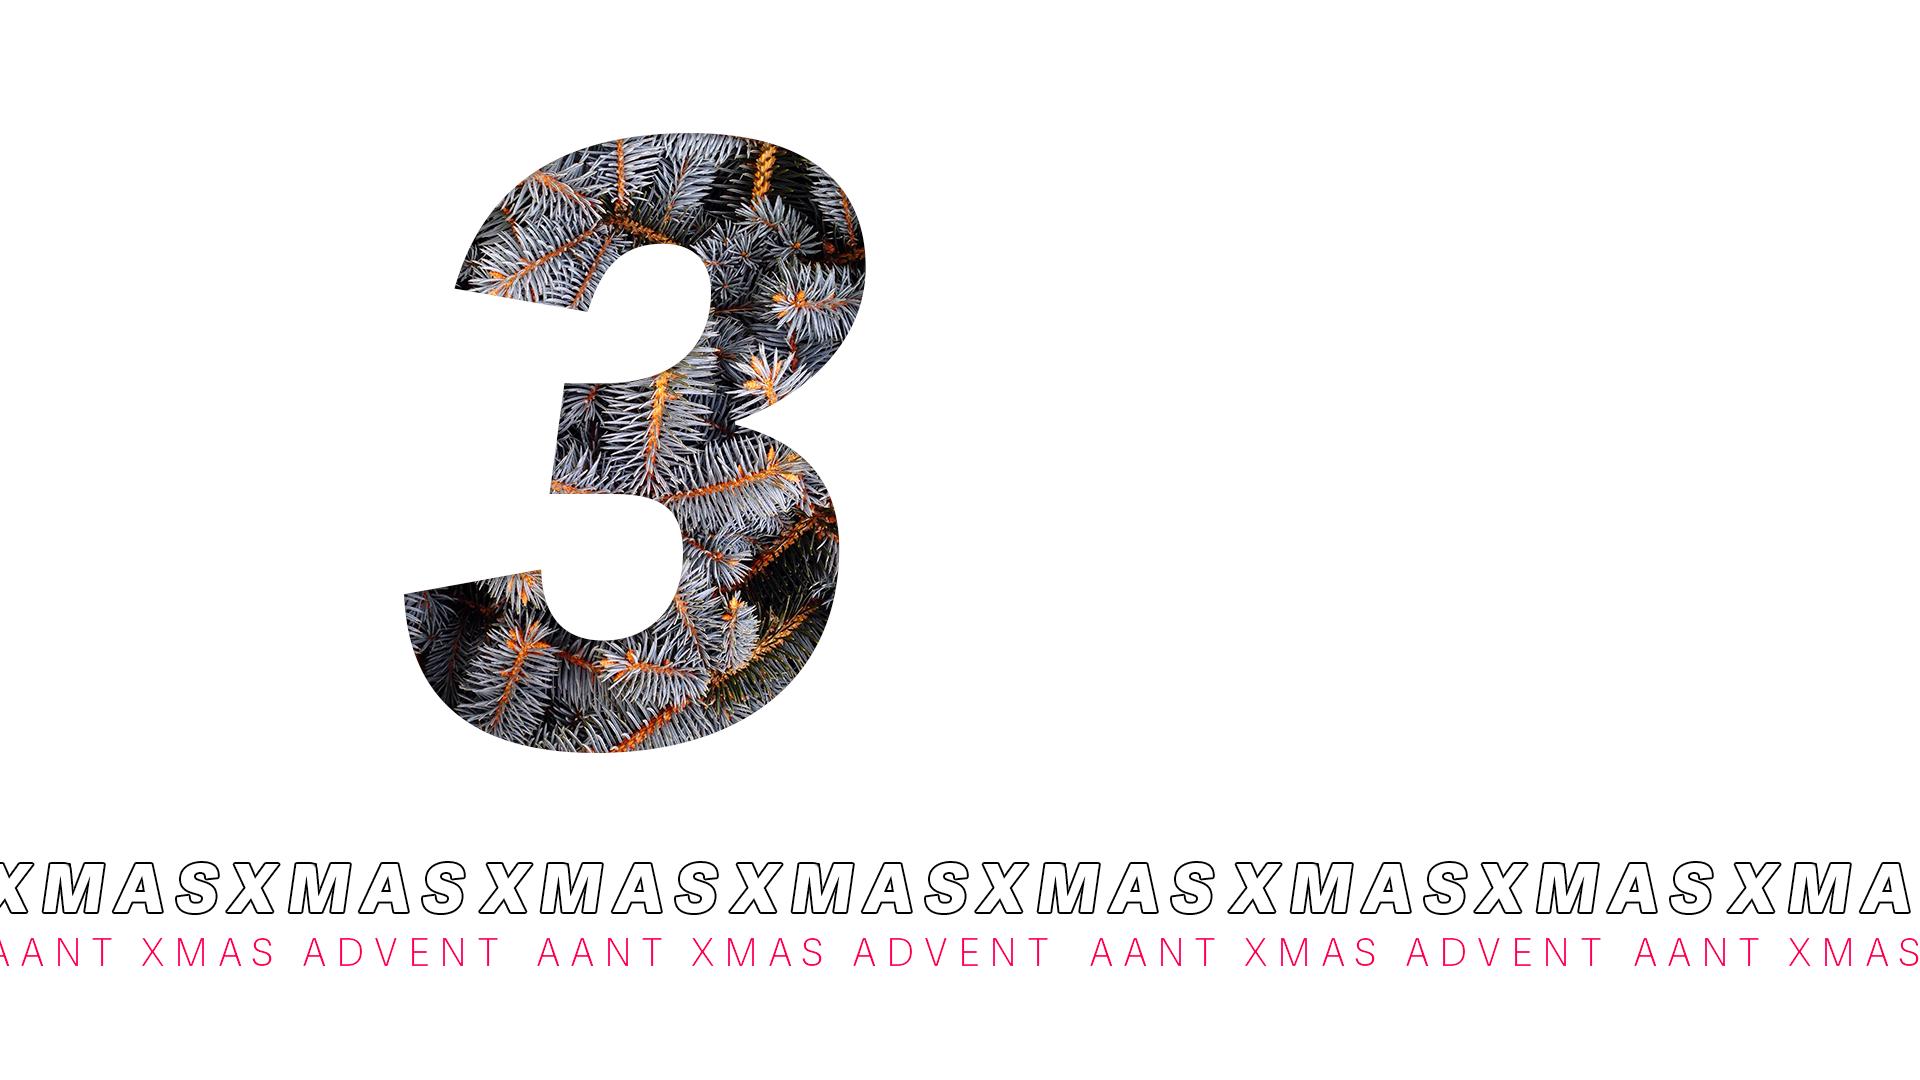 AANT XMAS ADVENT – 3 DICEMBRE 2020